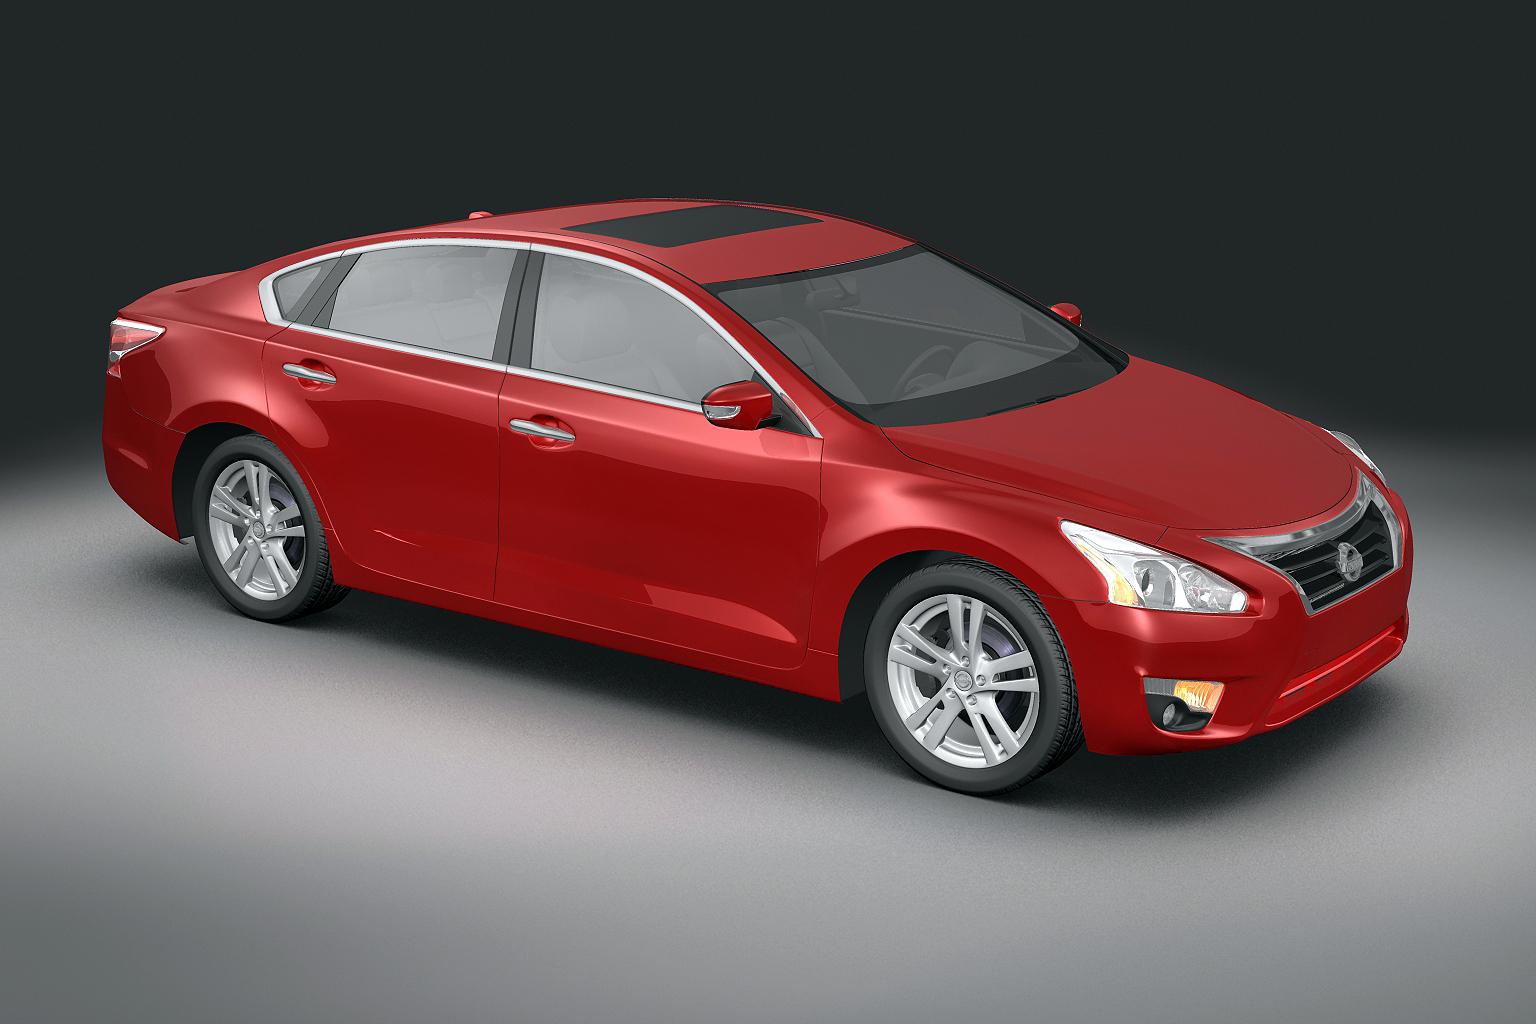 2013 nissan altima Model 3d 3ds max fbx lwo obj 141839